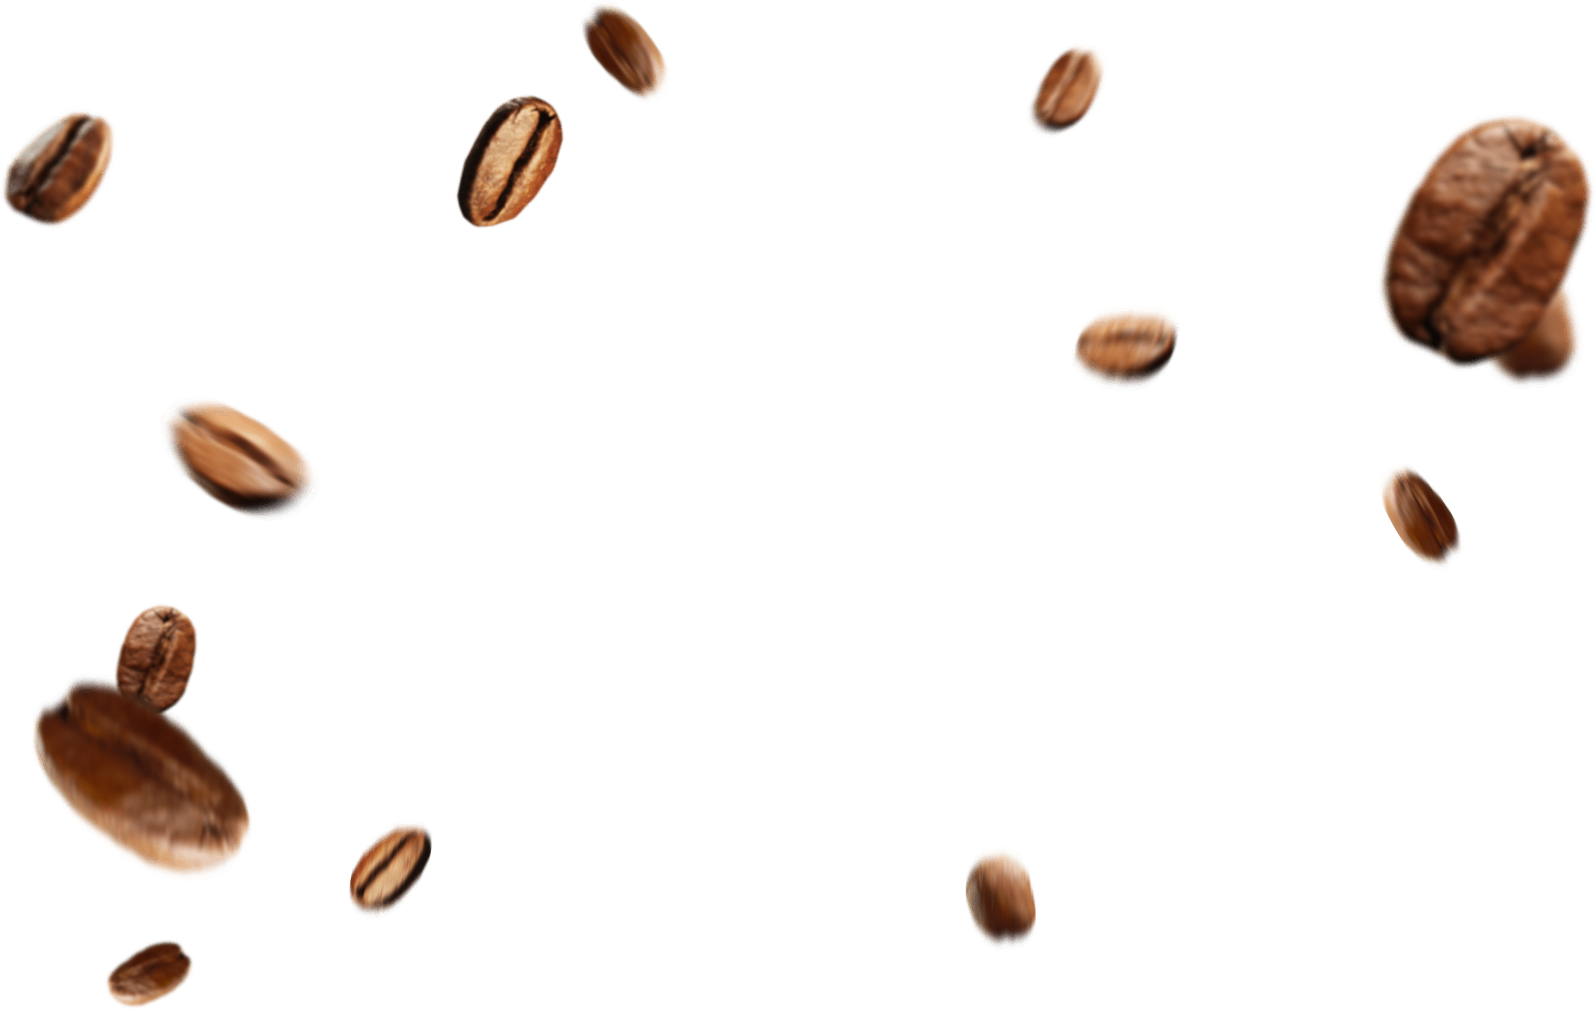 Grains clipart bean. Coffee beans png transparent